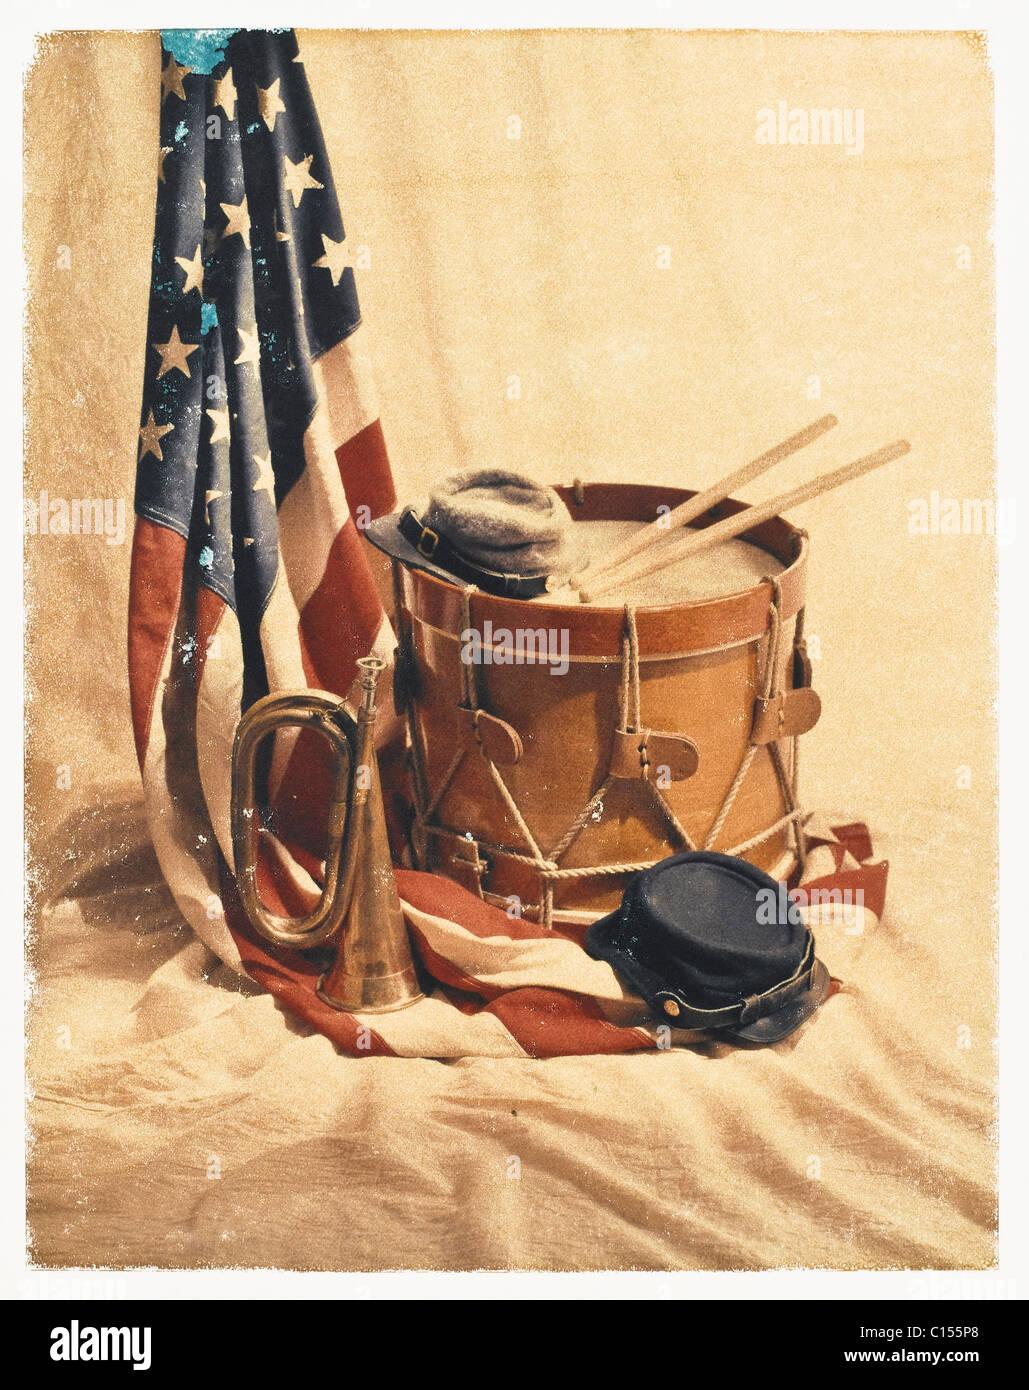 Still-life of civil war artifacts. - Stock Image